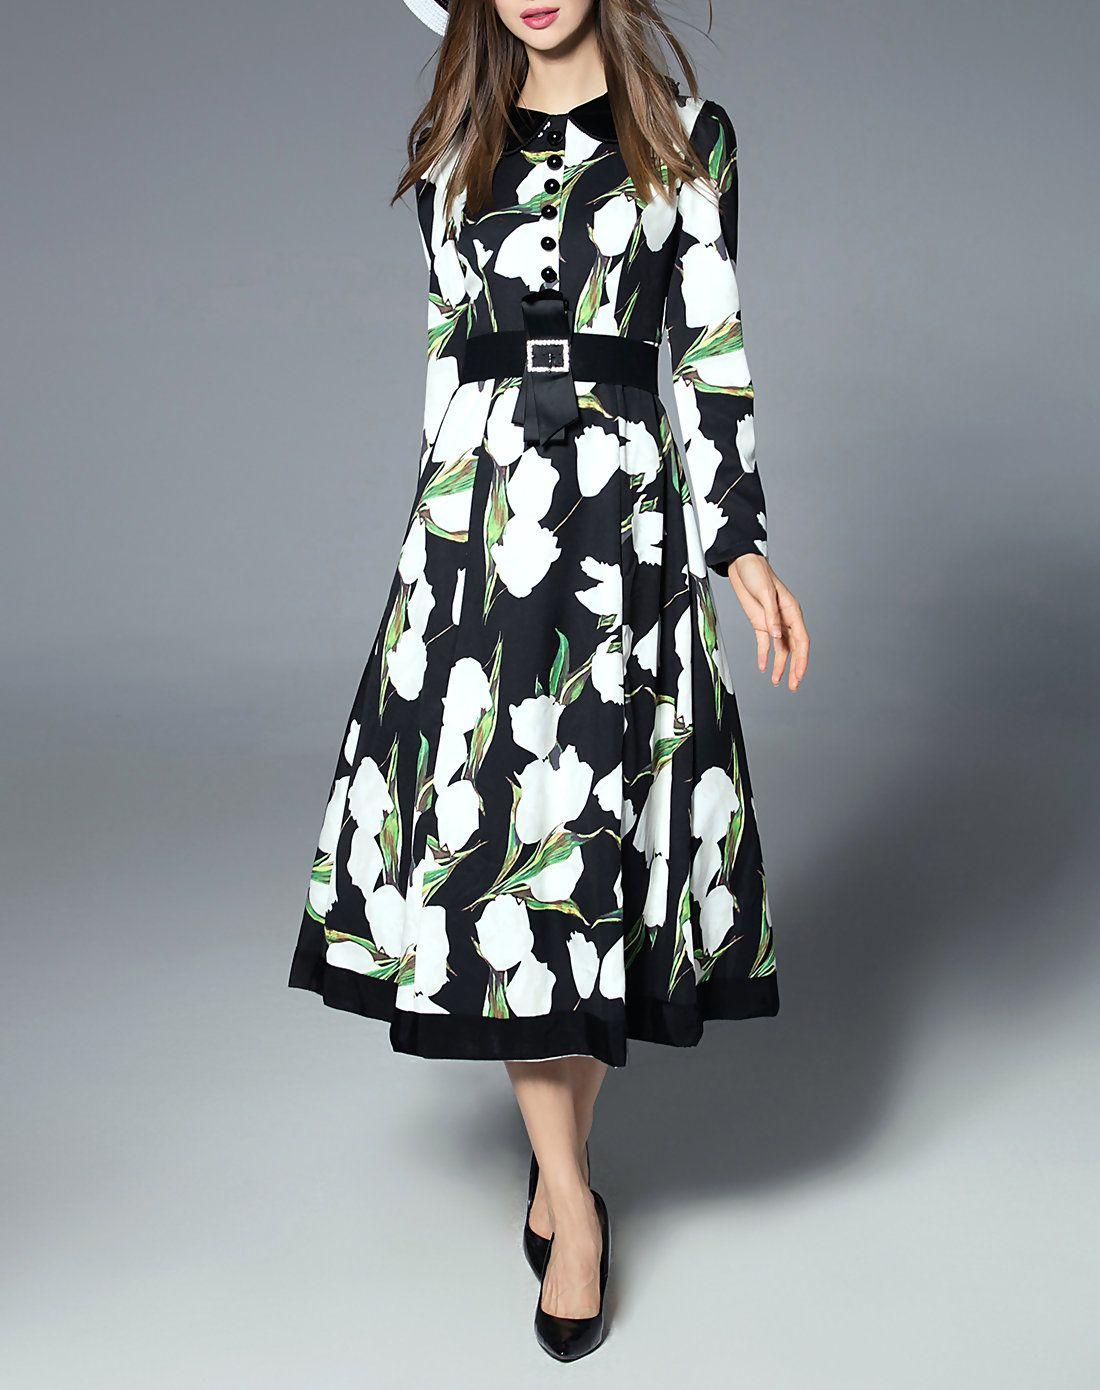 #AdoreWe #VIPme Shirt Dresses - LANJIAN Floral Print Collared Flare Midi Dress - AdoreWe.com